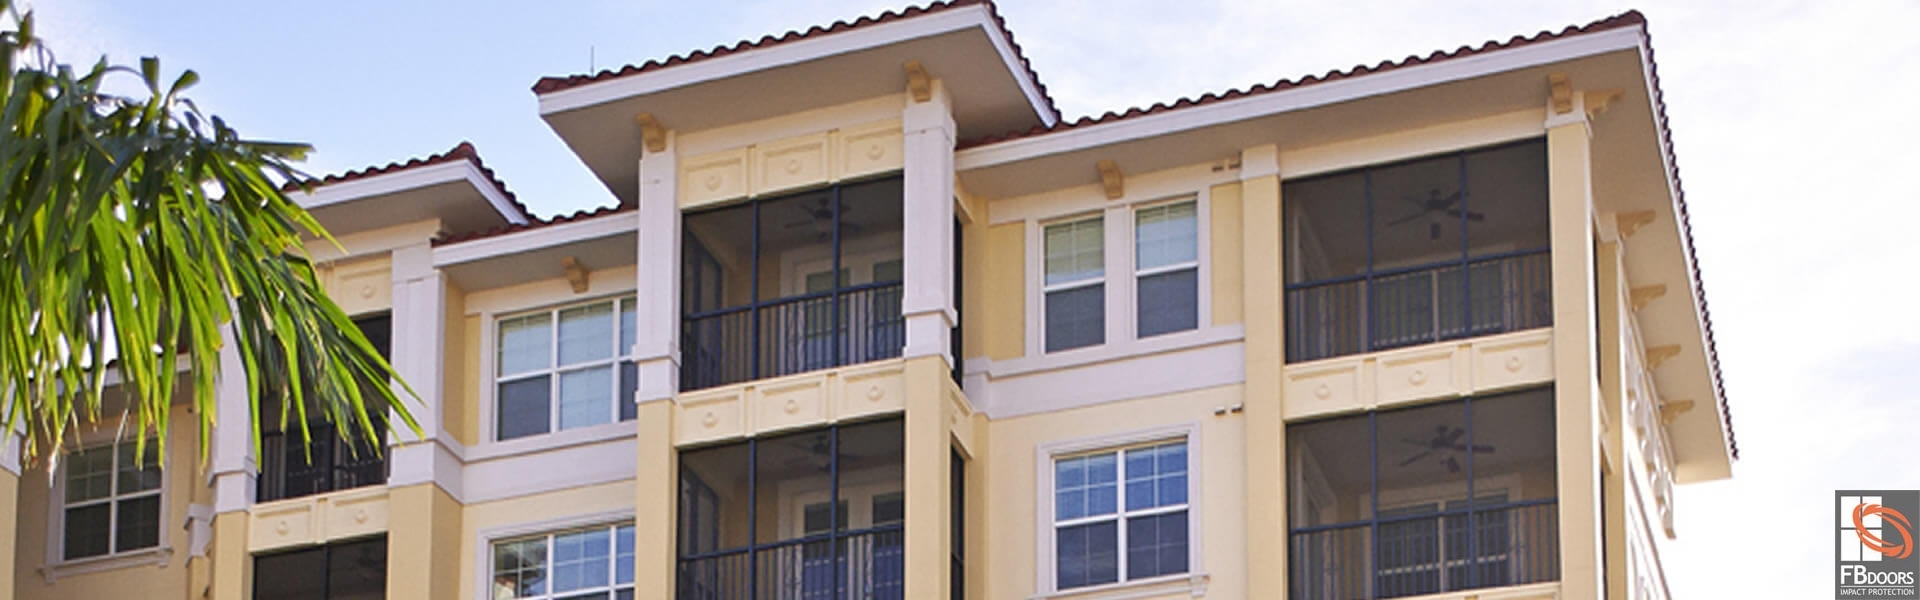 Custom Enclosed Balcony Fb Doors Impact Windows In Florida